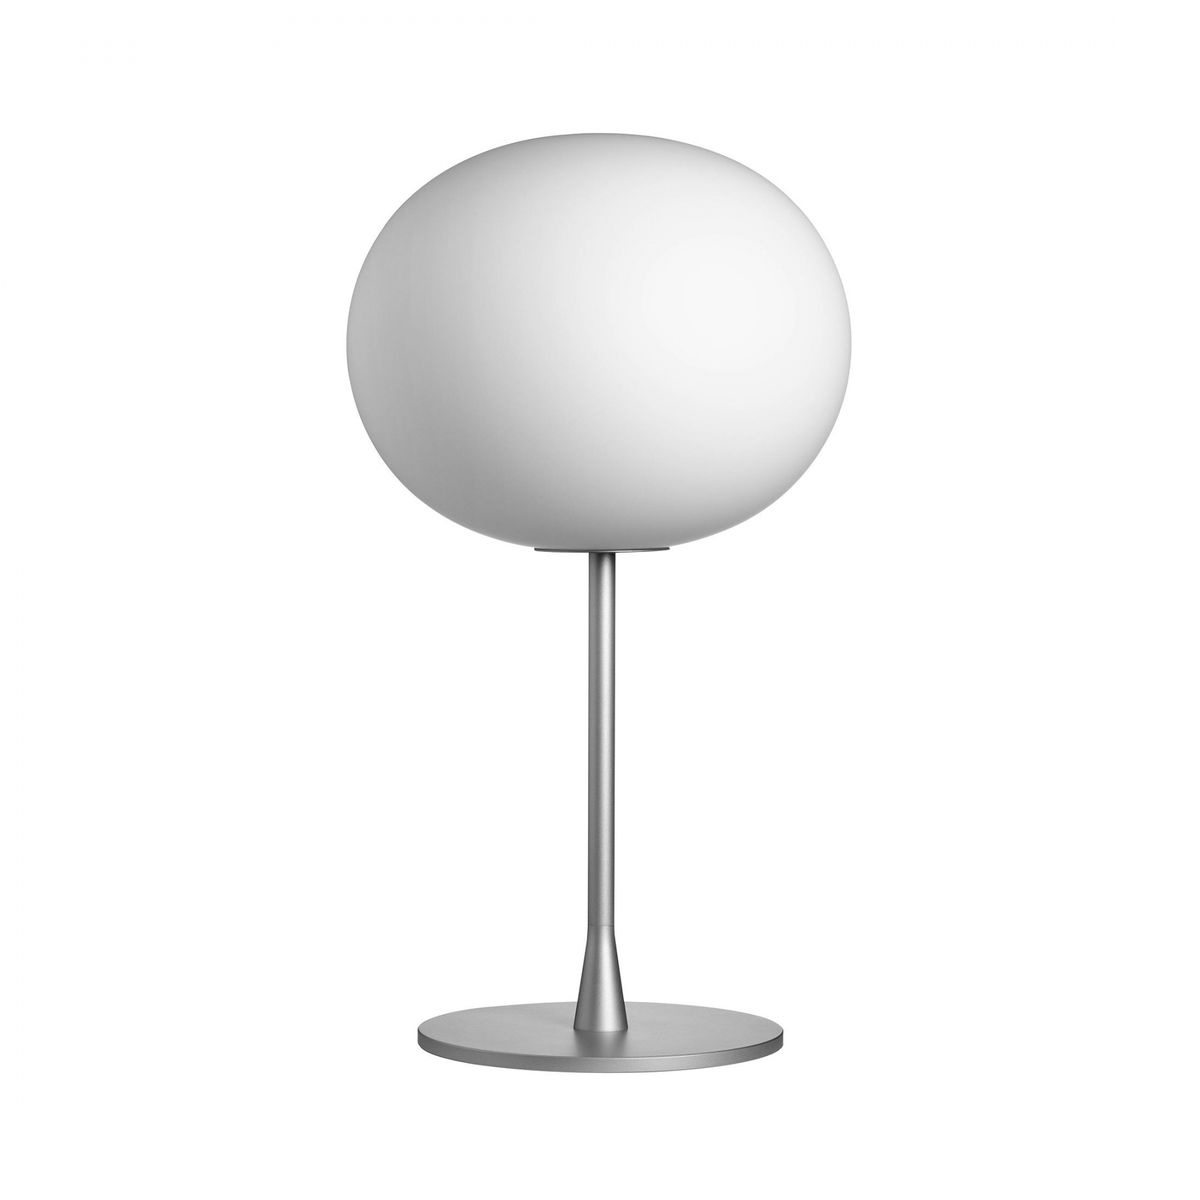 ball table lamp. flos - glo ball t1 table lamp opal/grey/matt/h 60cm m